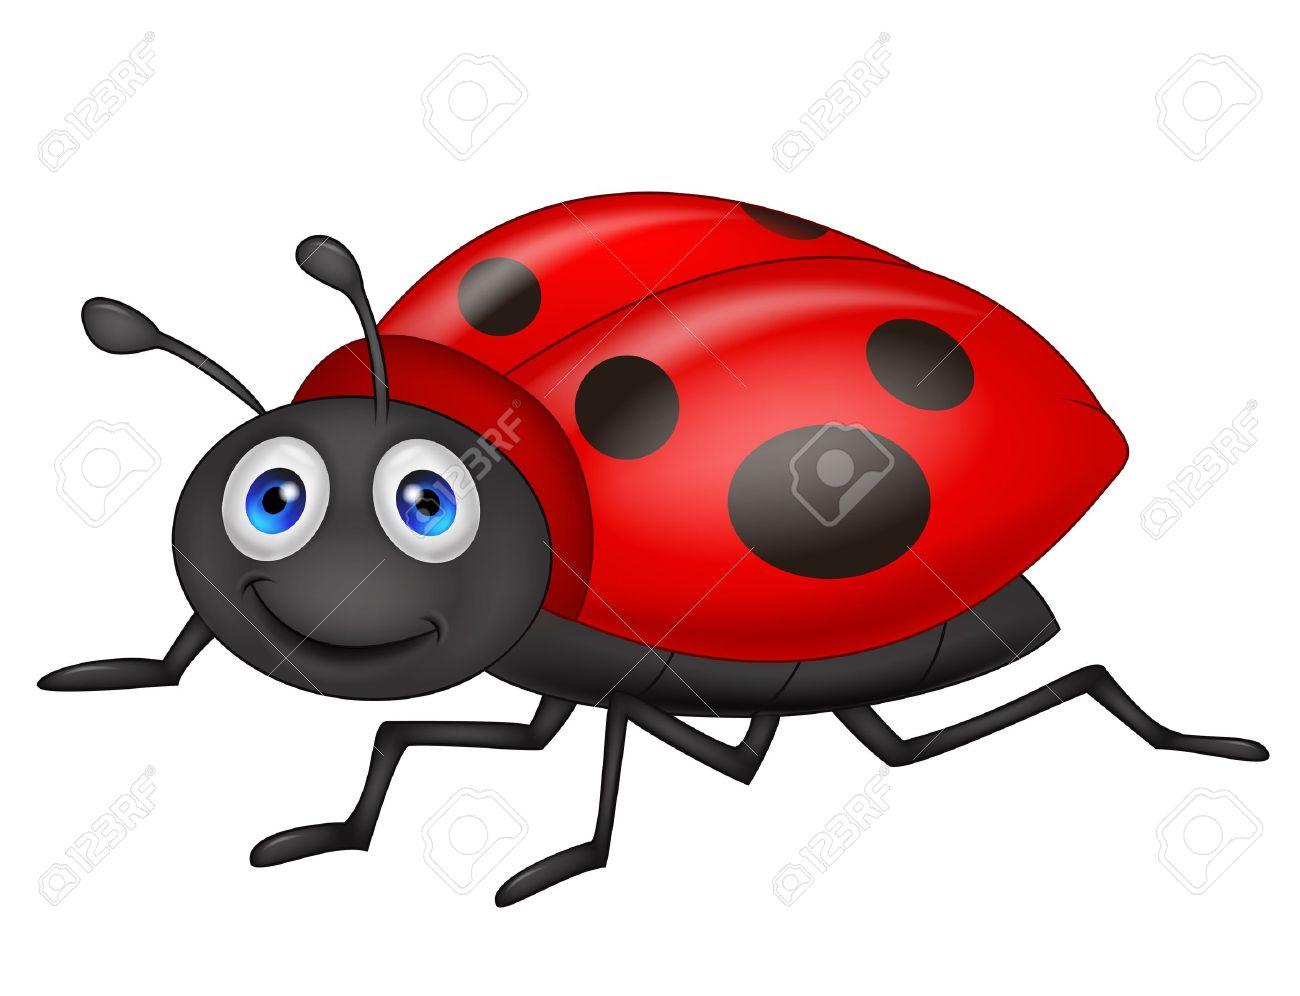 Cute Ladybug Cartoon Royalty Free Cliparts, Vectors, And Stock ...